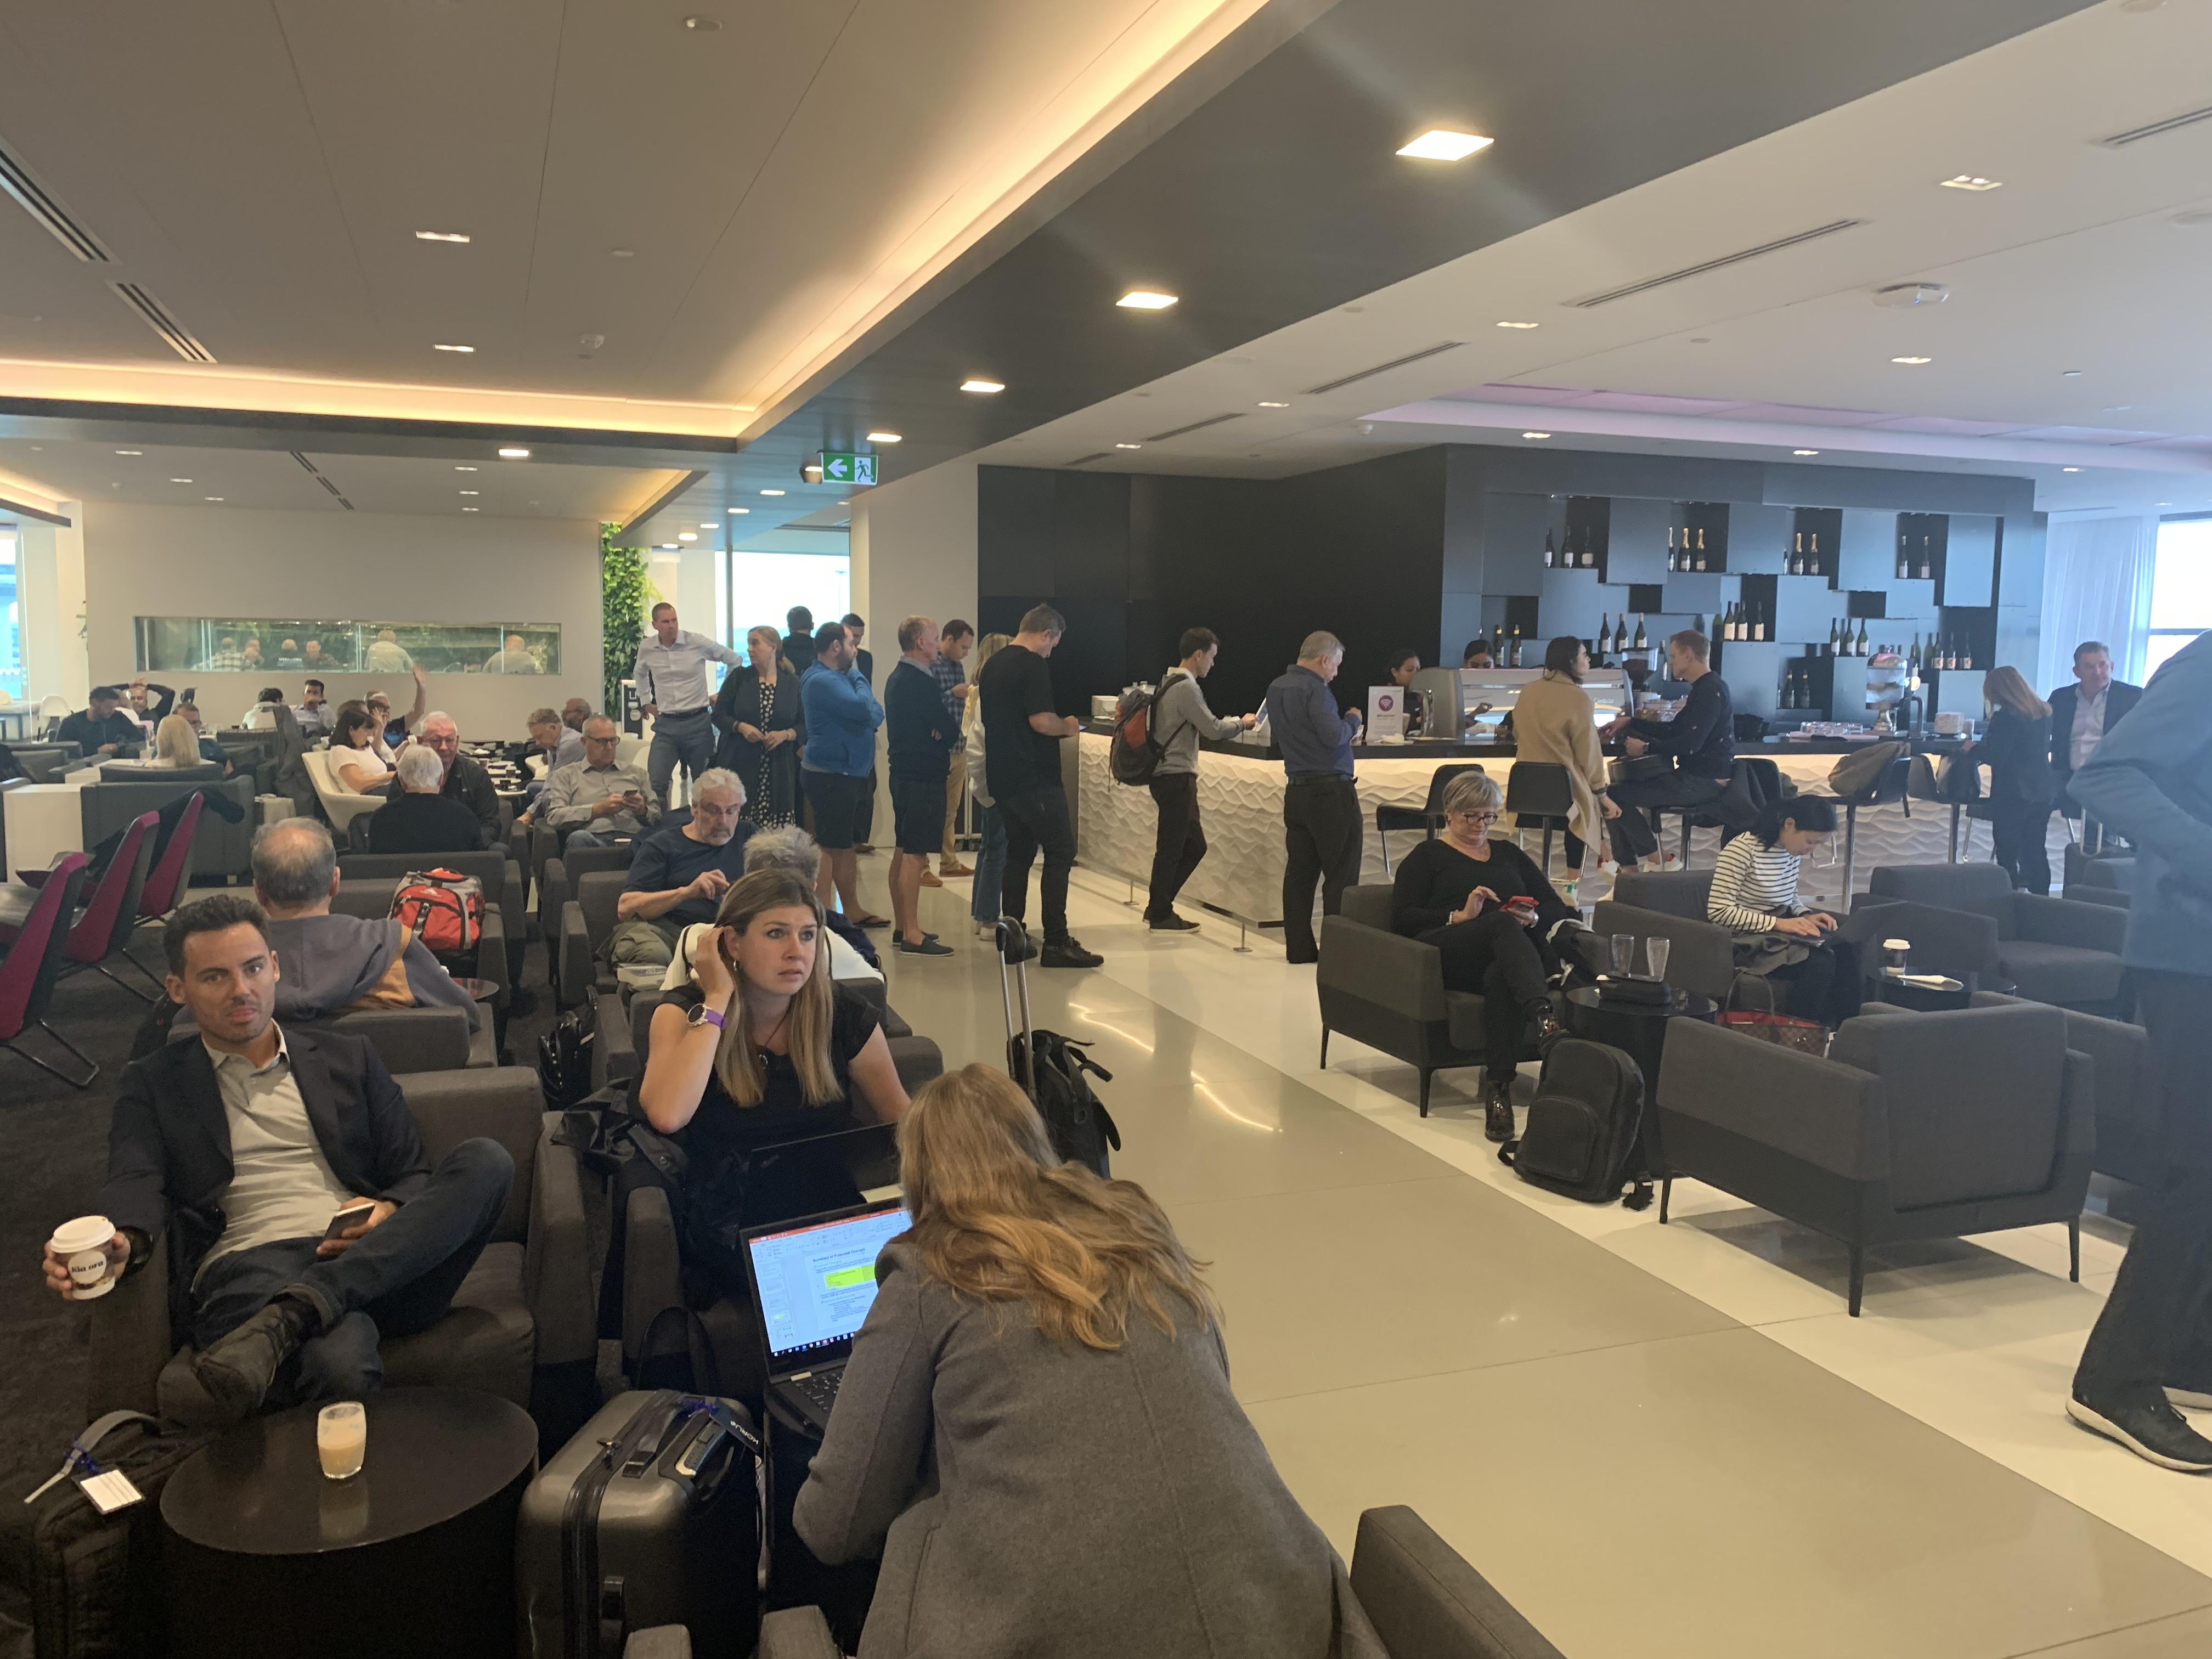 Air New Zealand Customer Reviews | SKYTRAX